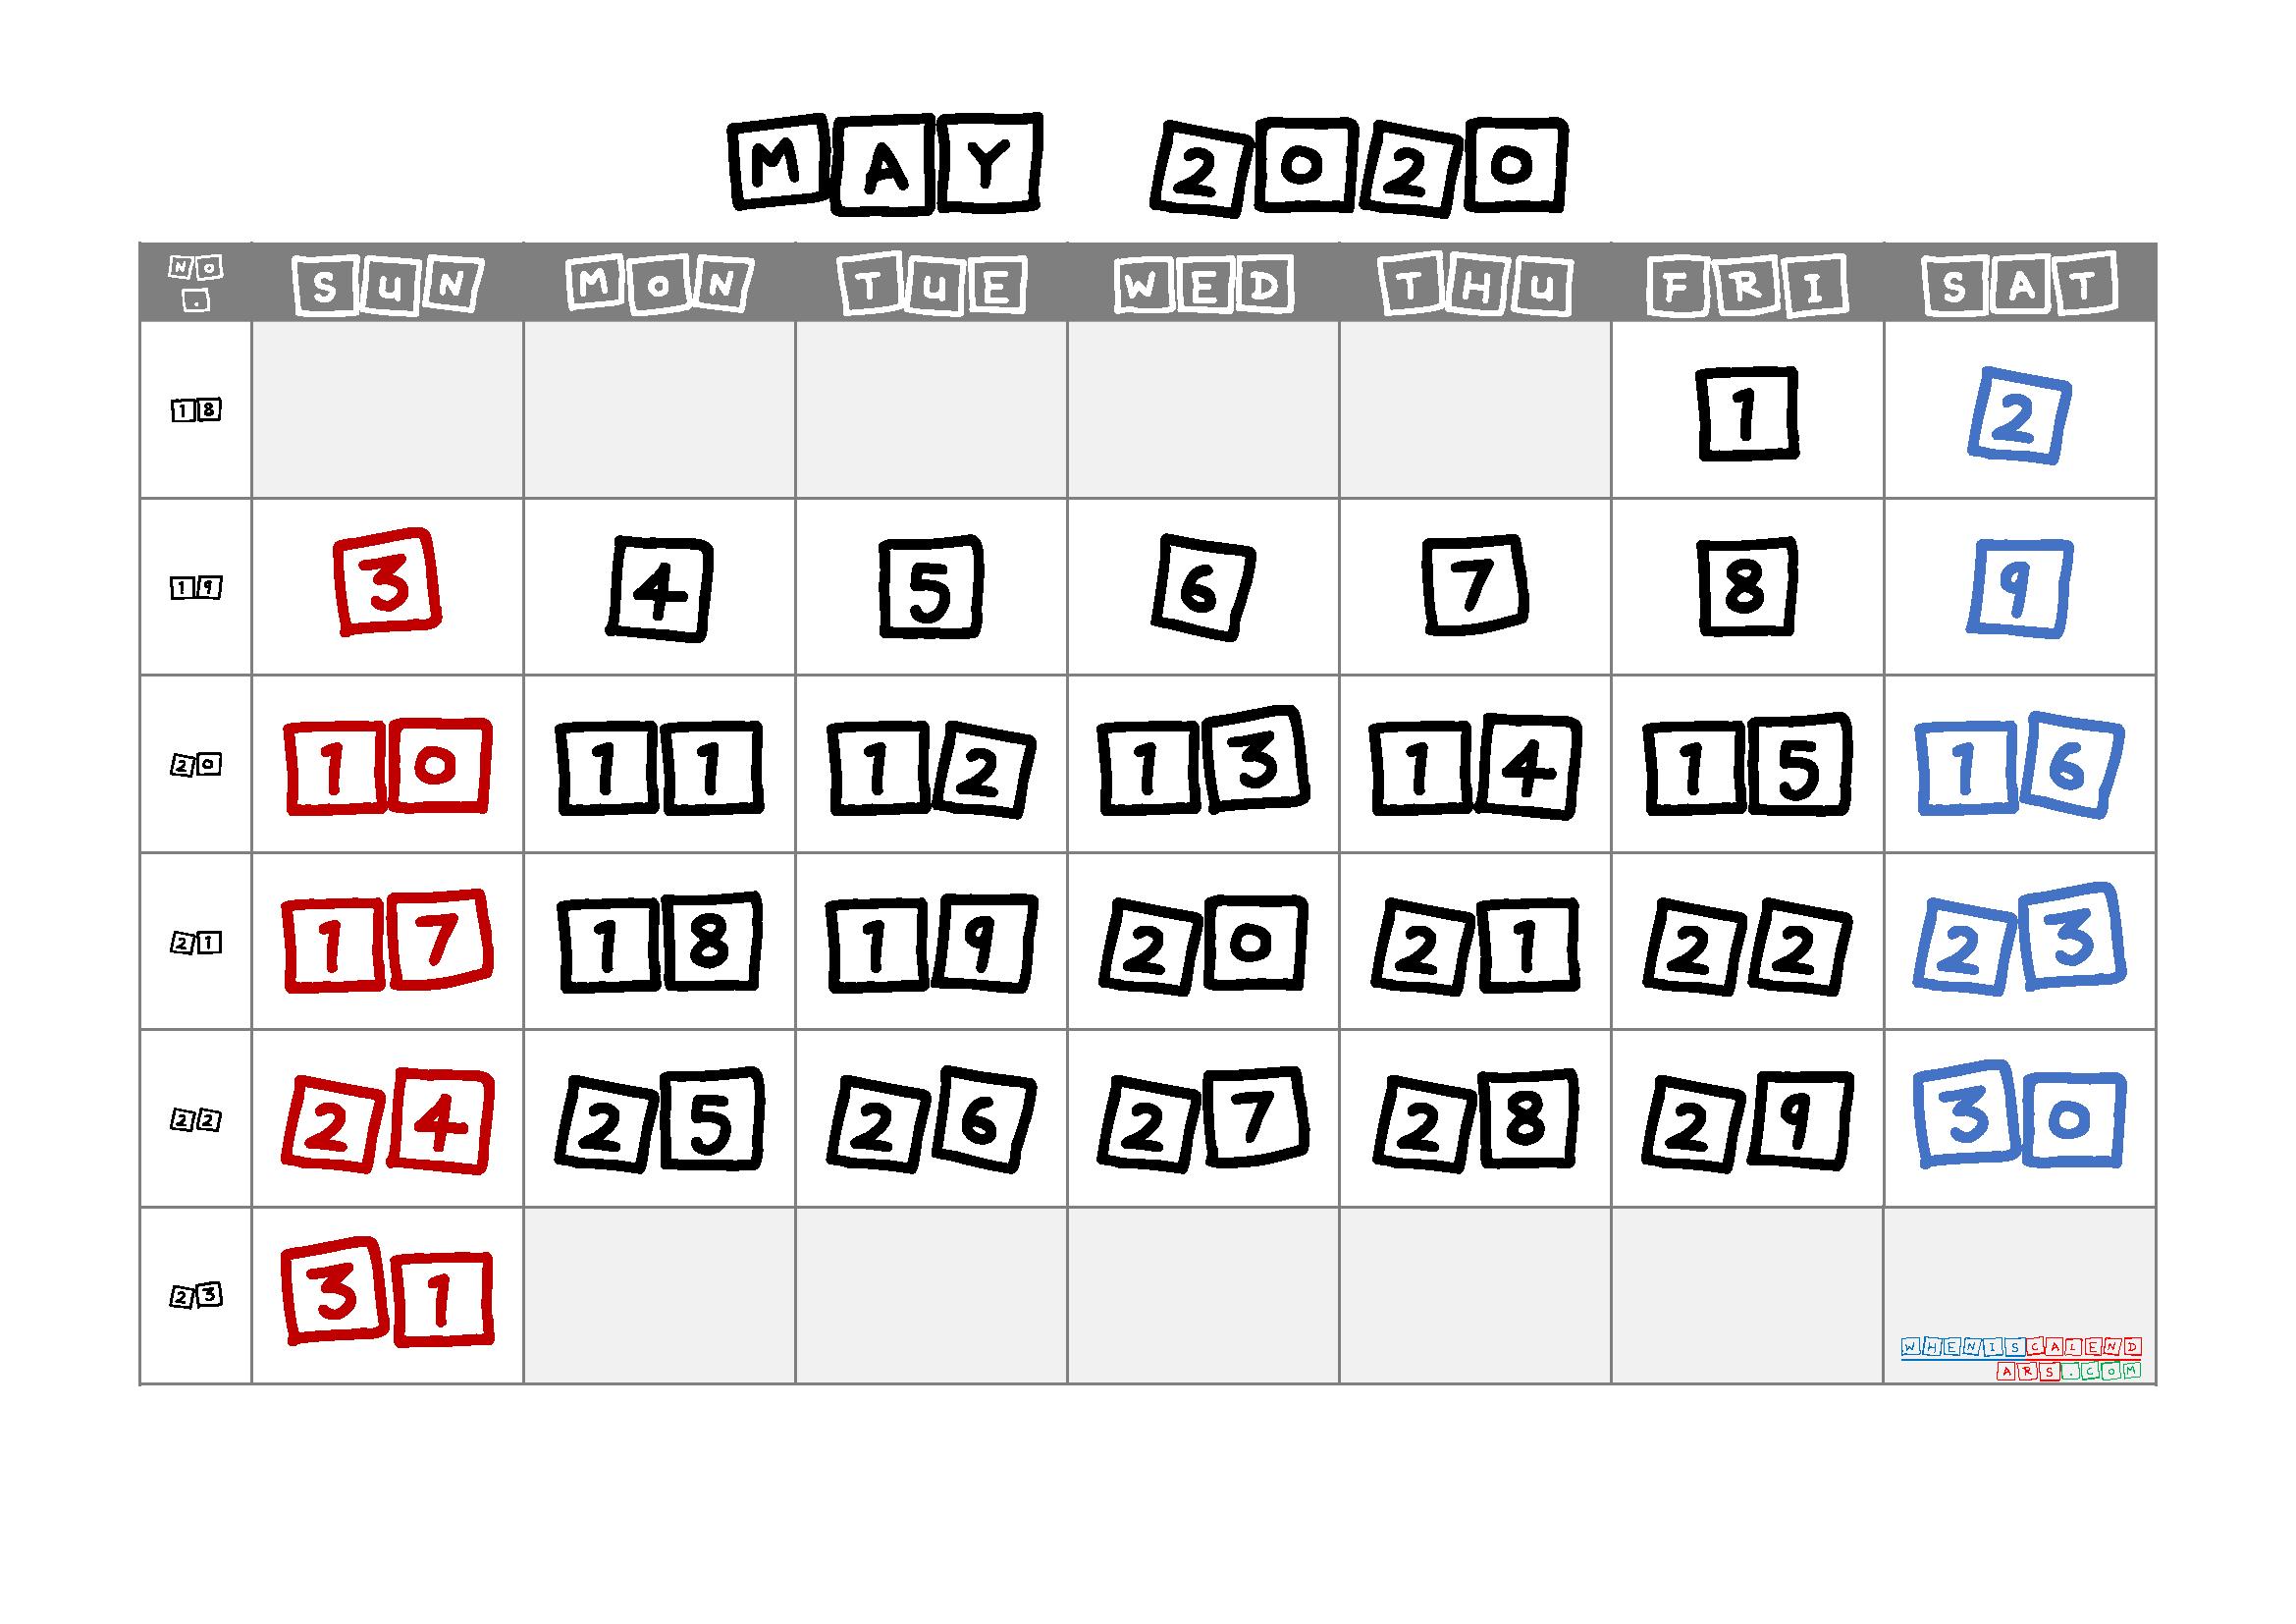 May 2020 Printable Calendar